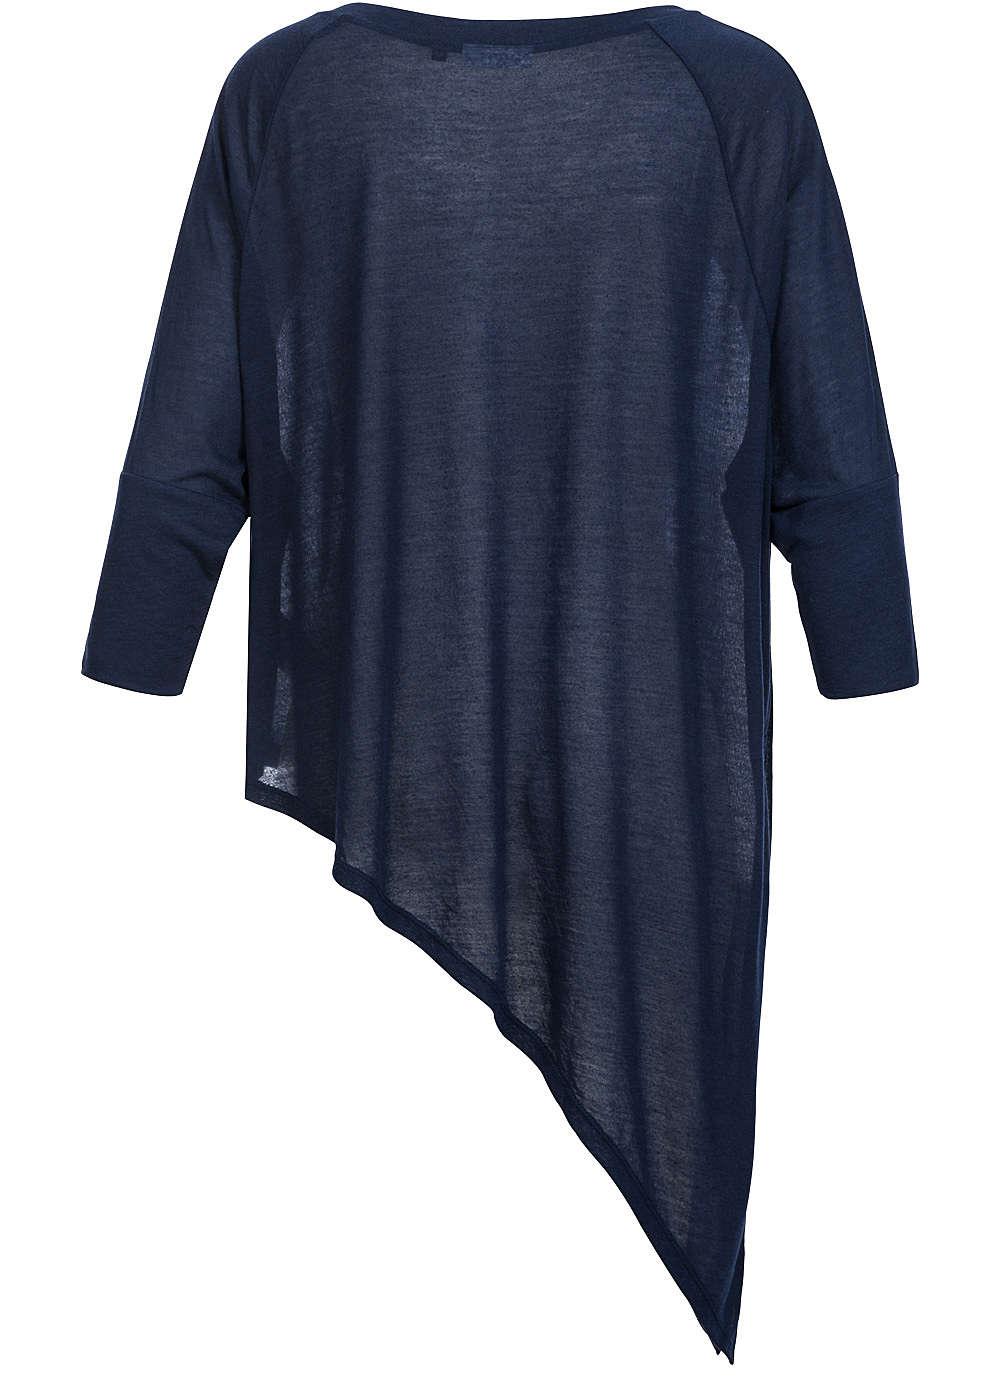 only damen shirt 3 4 rmel asym schnitt oversize navy blazer ebay. Black Bedroom Furniture Sets. Home Design Ideas